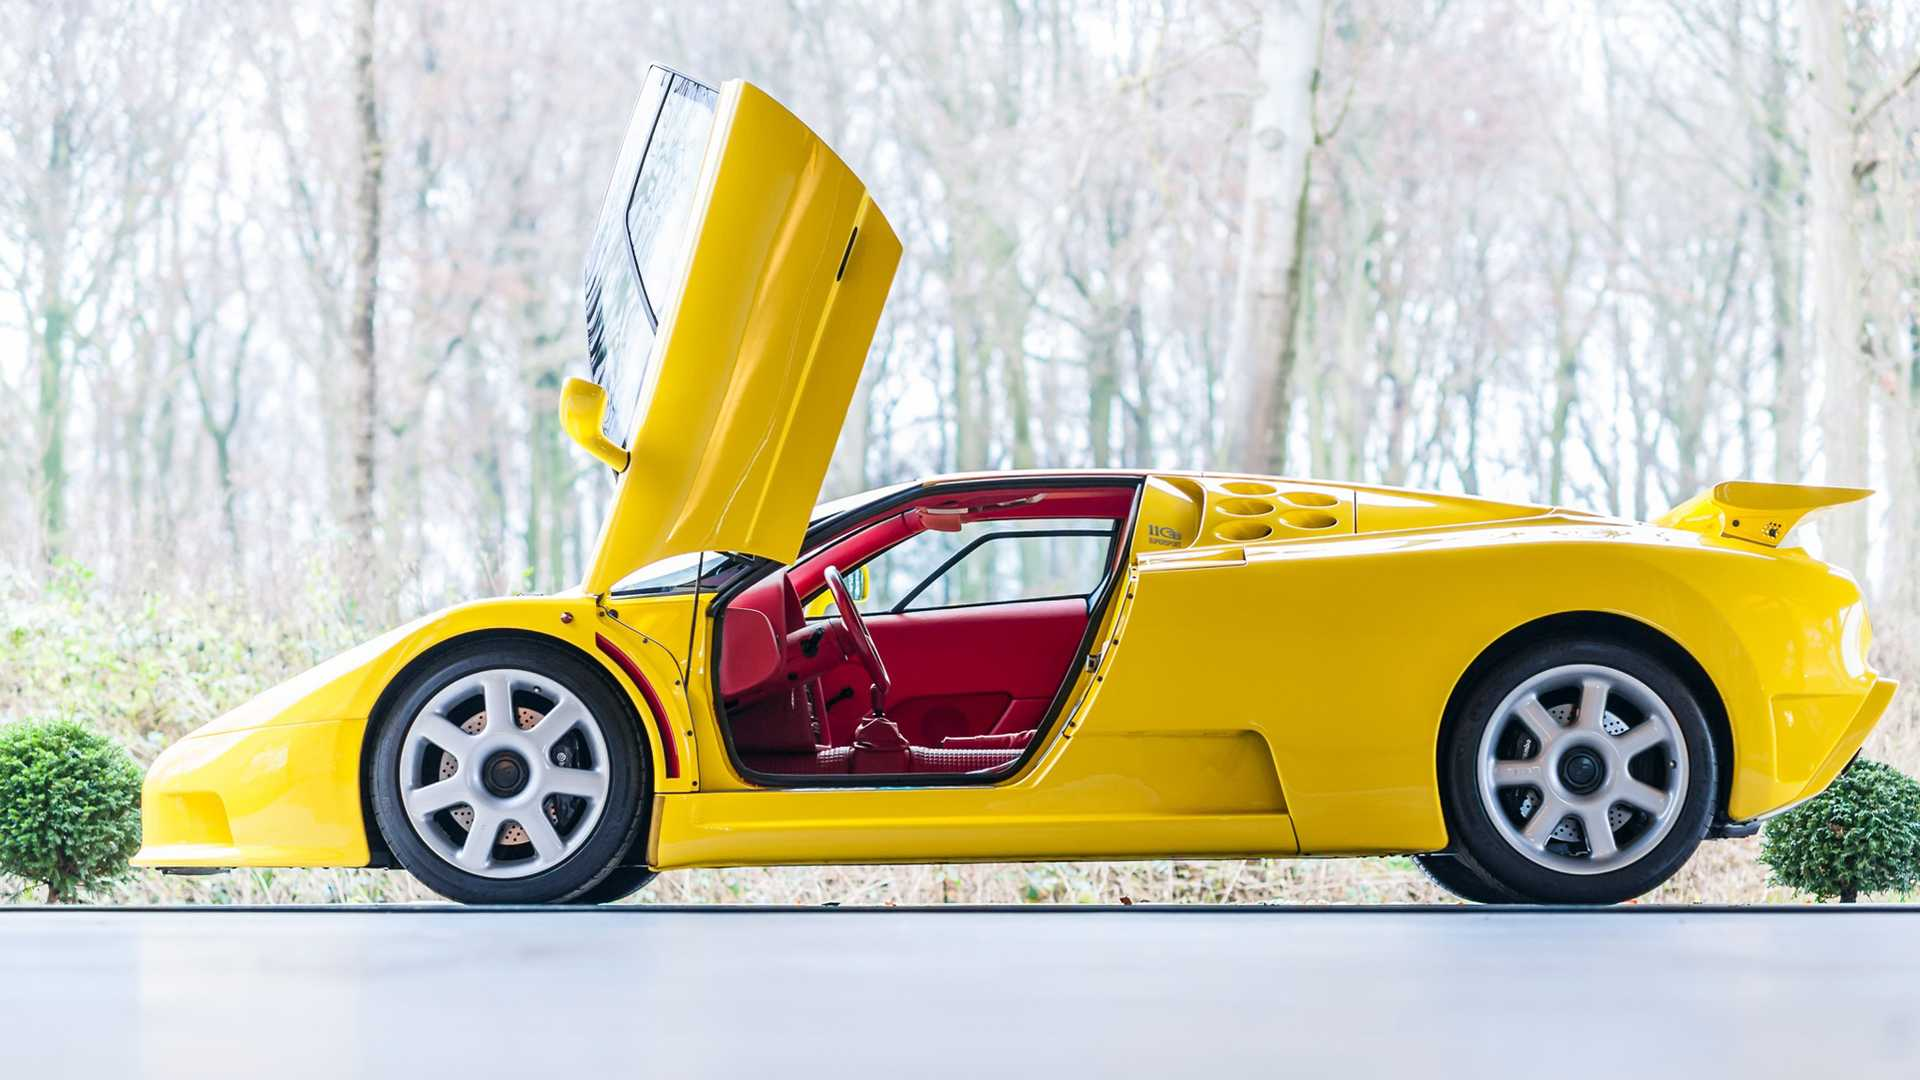 Bugatti_EB110_SS_sale_0006